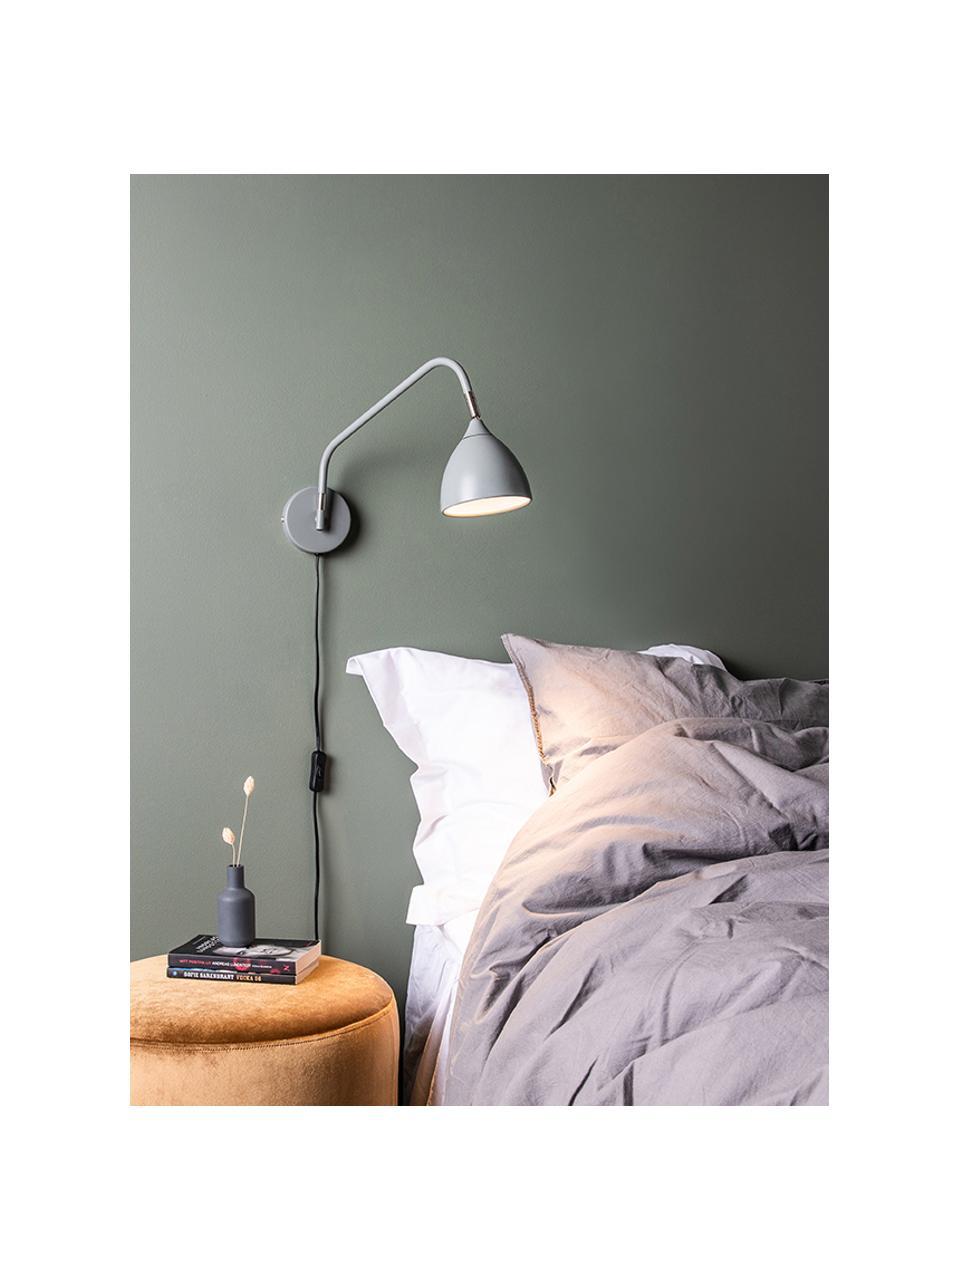 Wandleuchte Valencia mit Stecker, Lampenschirm: Metall, lackiert, Diffusorscheibe: Kunststoff, Dekor: Metall, Grau, 12 x 22 cm